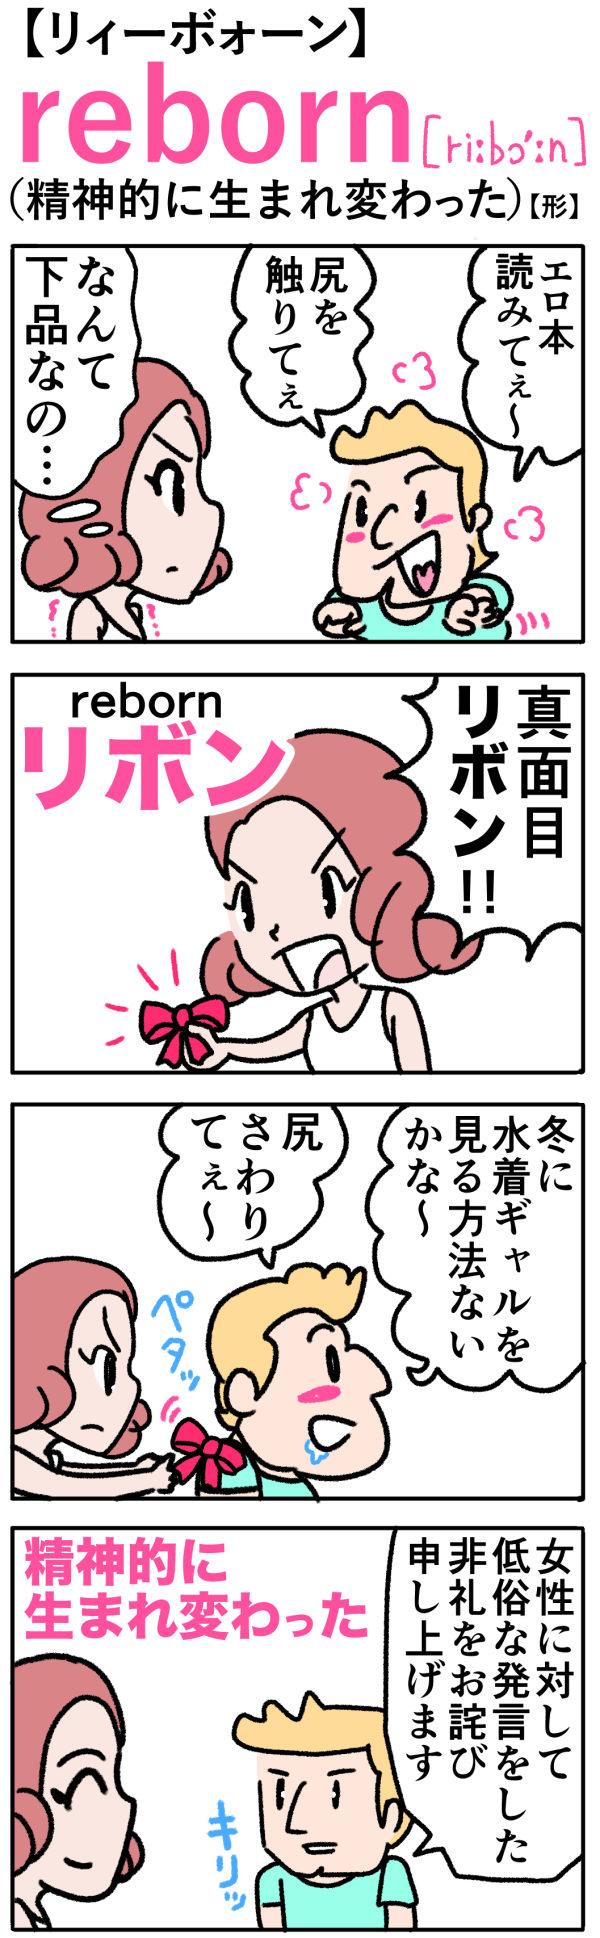 reborn(精神的に生まれ変った)の語呂合わせ英単語